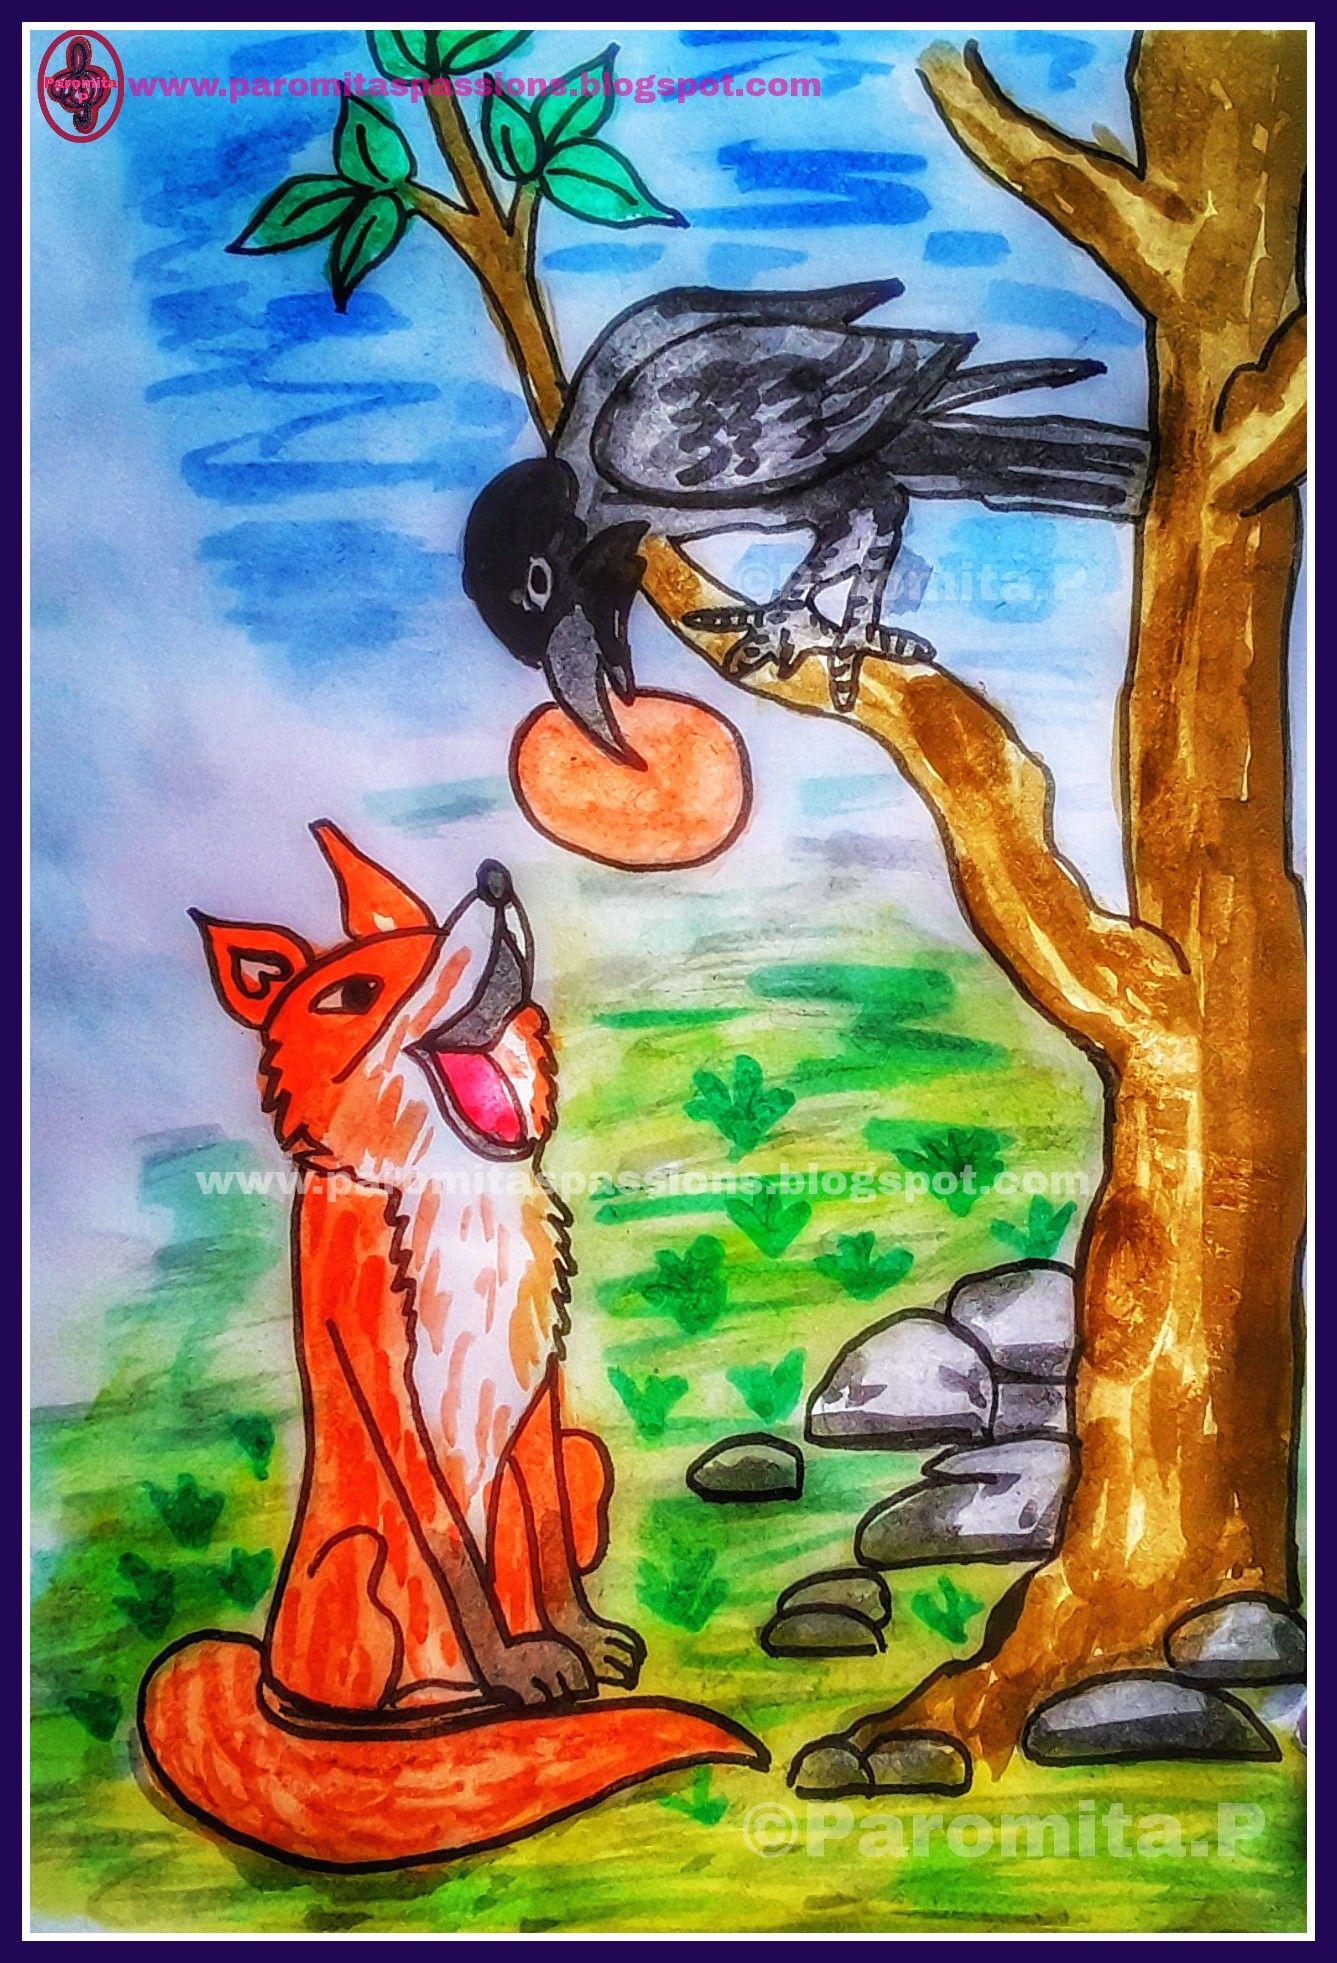 Hindi Story Foolish Crow and Cunning Fox Cunning fox